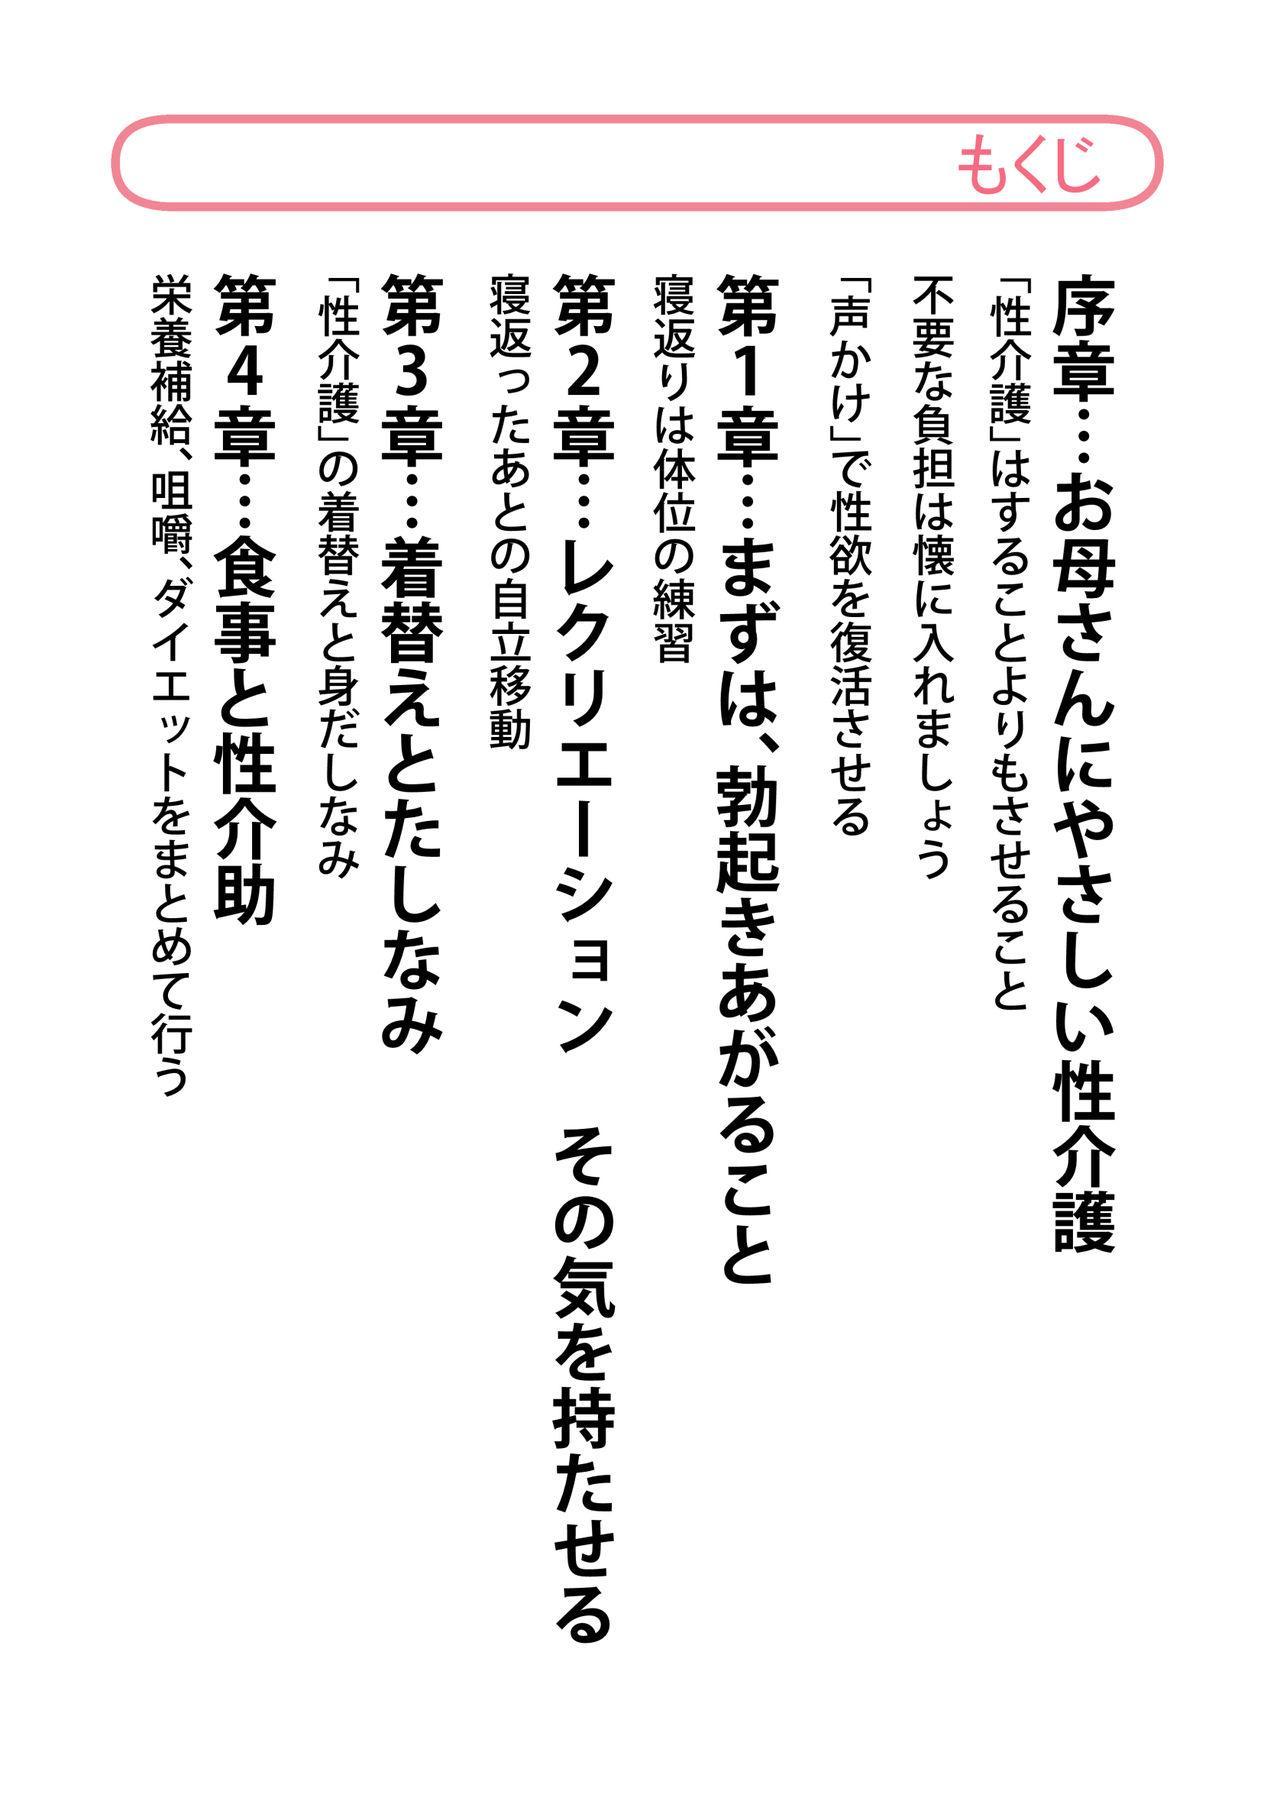 Isogasii Okaasan No Tamuno Sasa Rouzin Seikaigo | Guide for Elderly Sex Health Care to Busy Mom 5